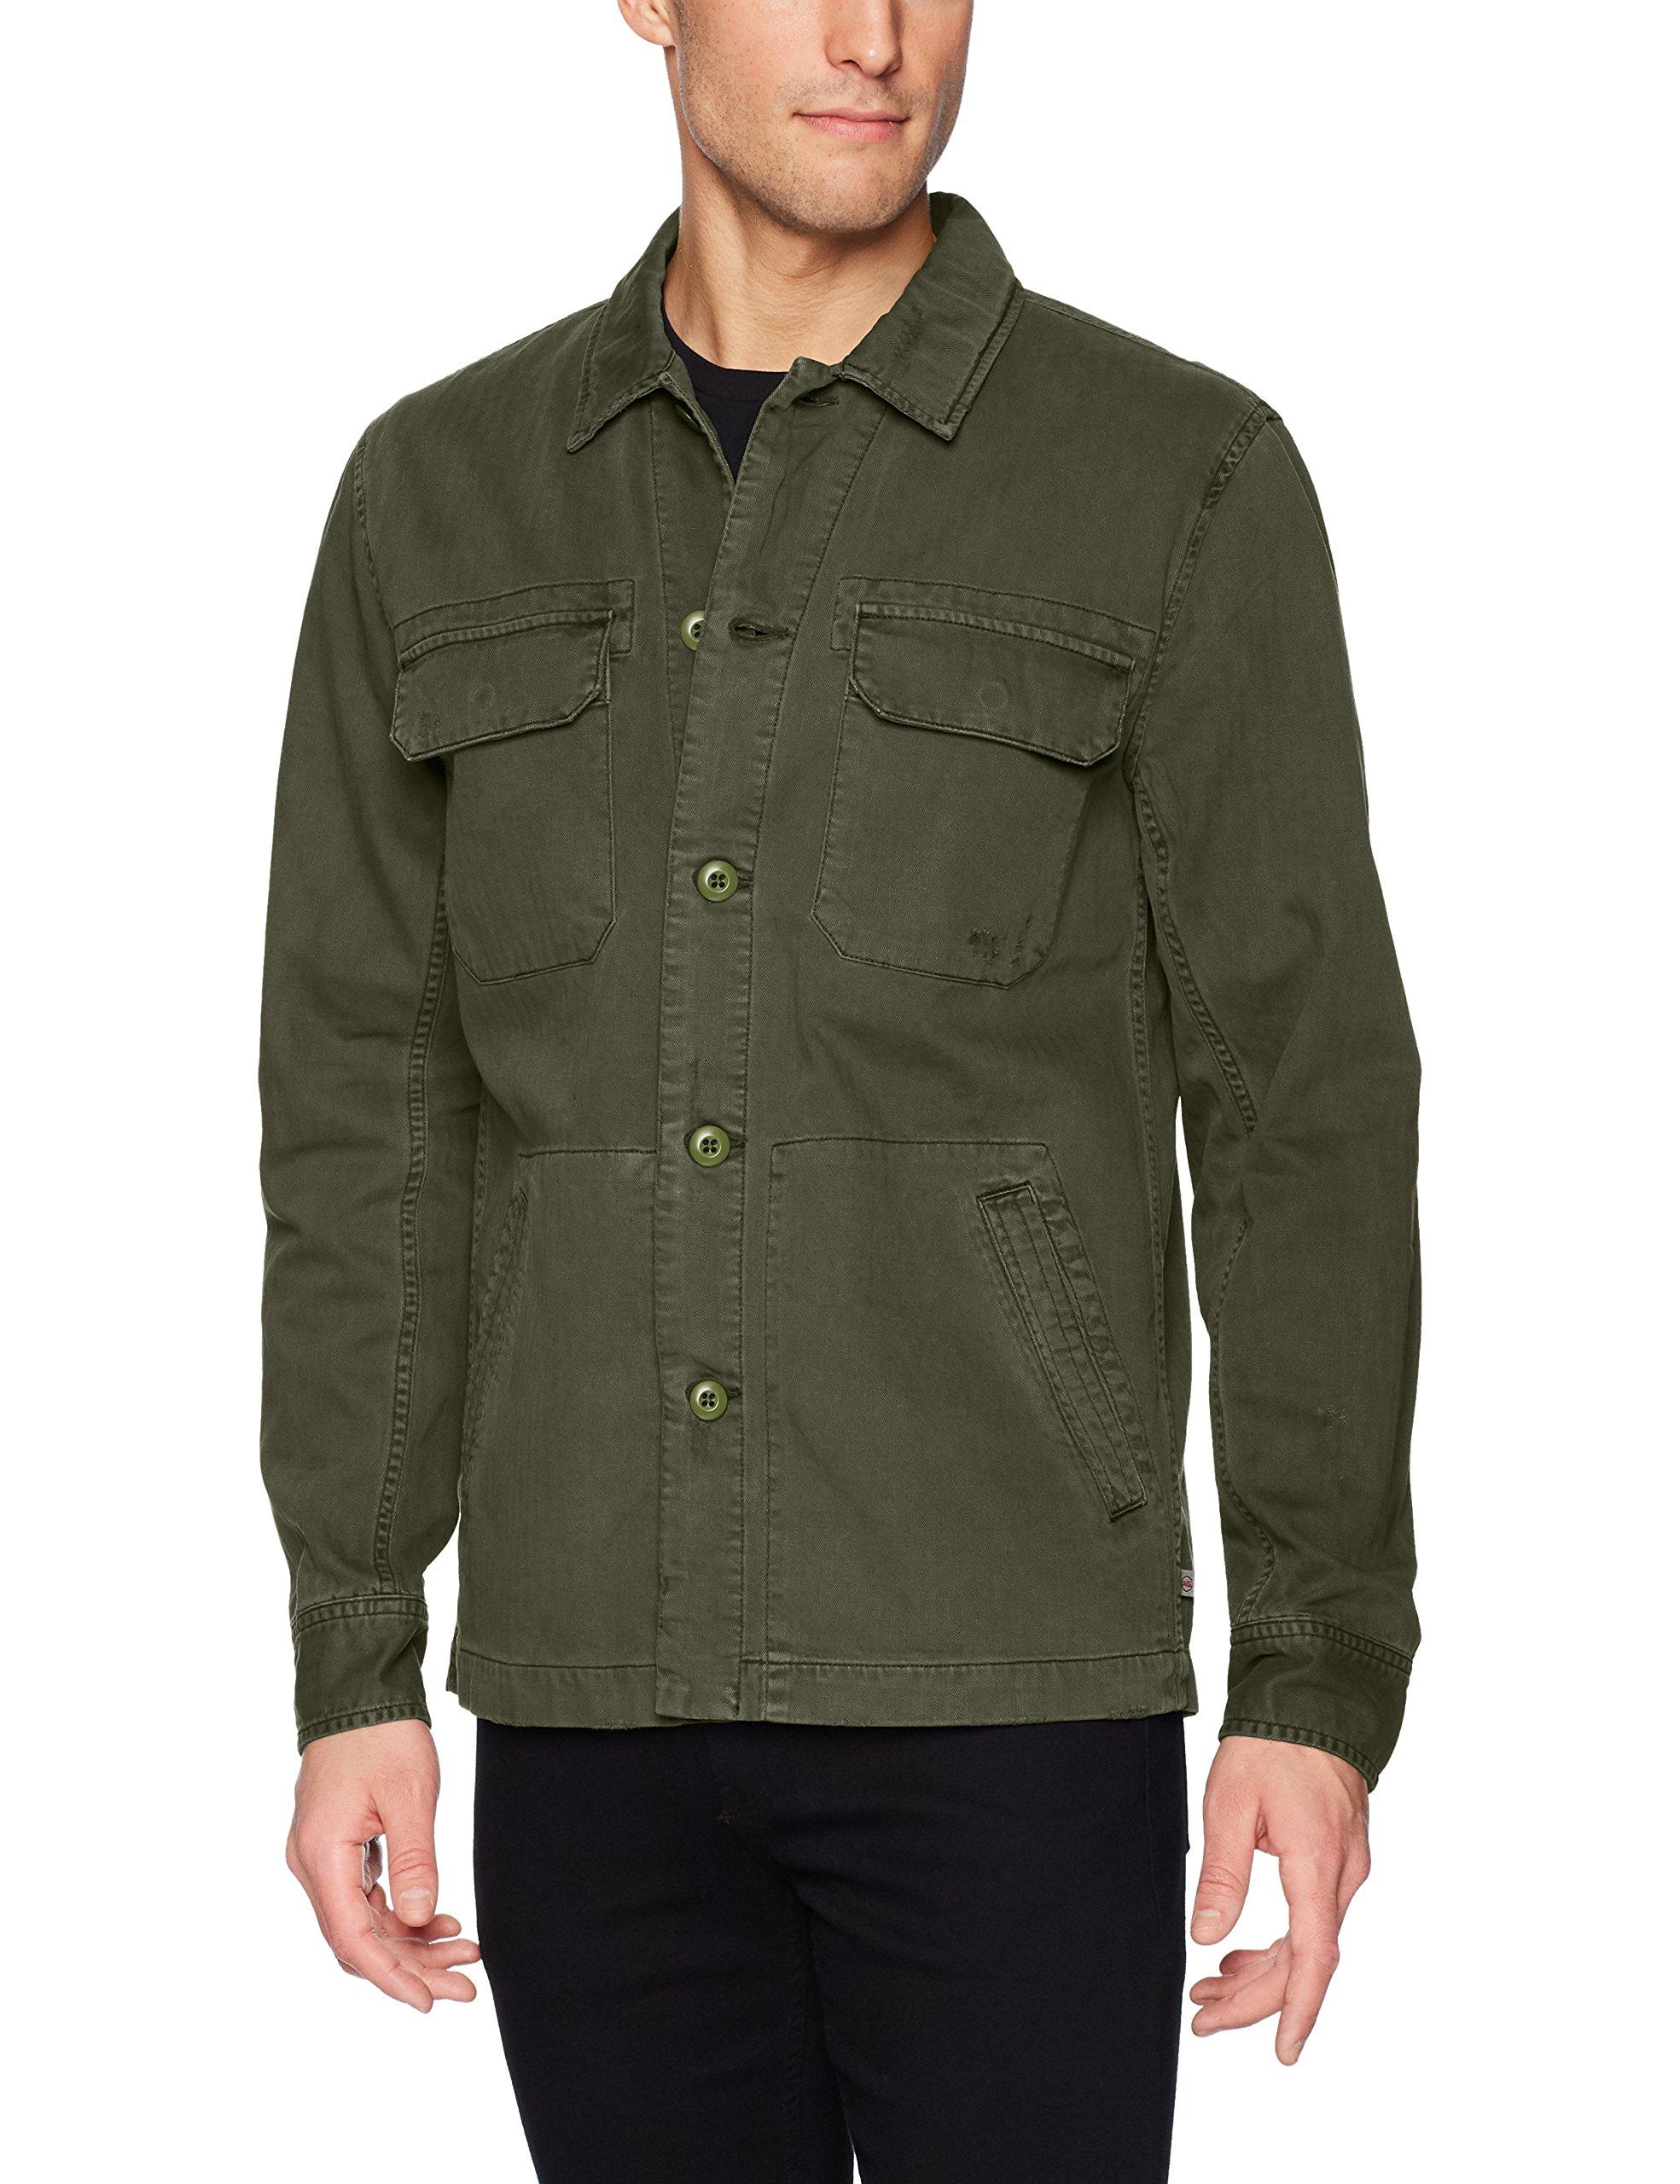 AG Adriano Goldschmied Men's Marx Cotton Herringbone Long Sleeve Field Jacket, Years Pigment Desert Pine, S